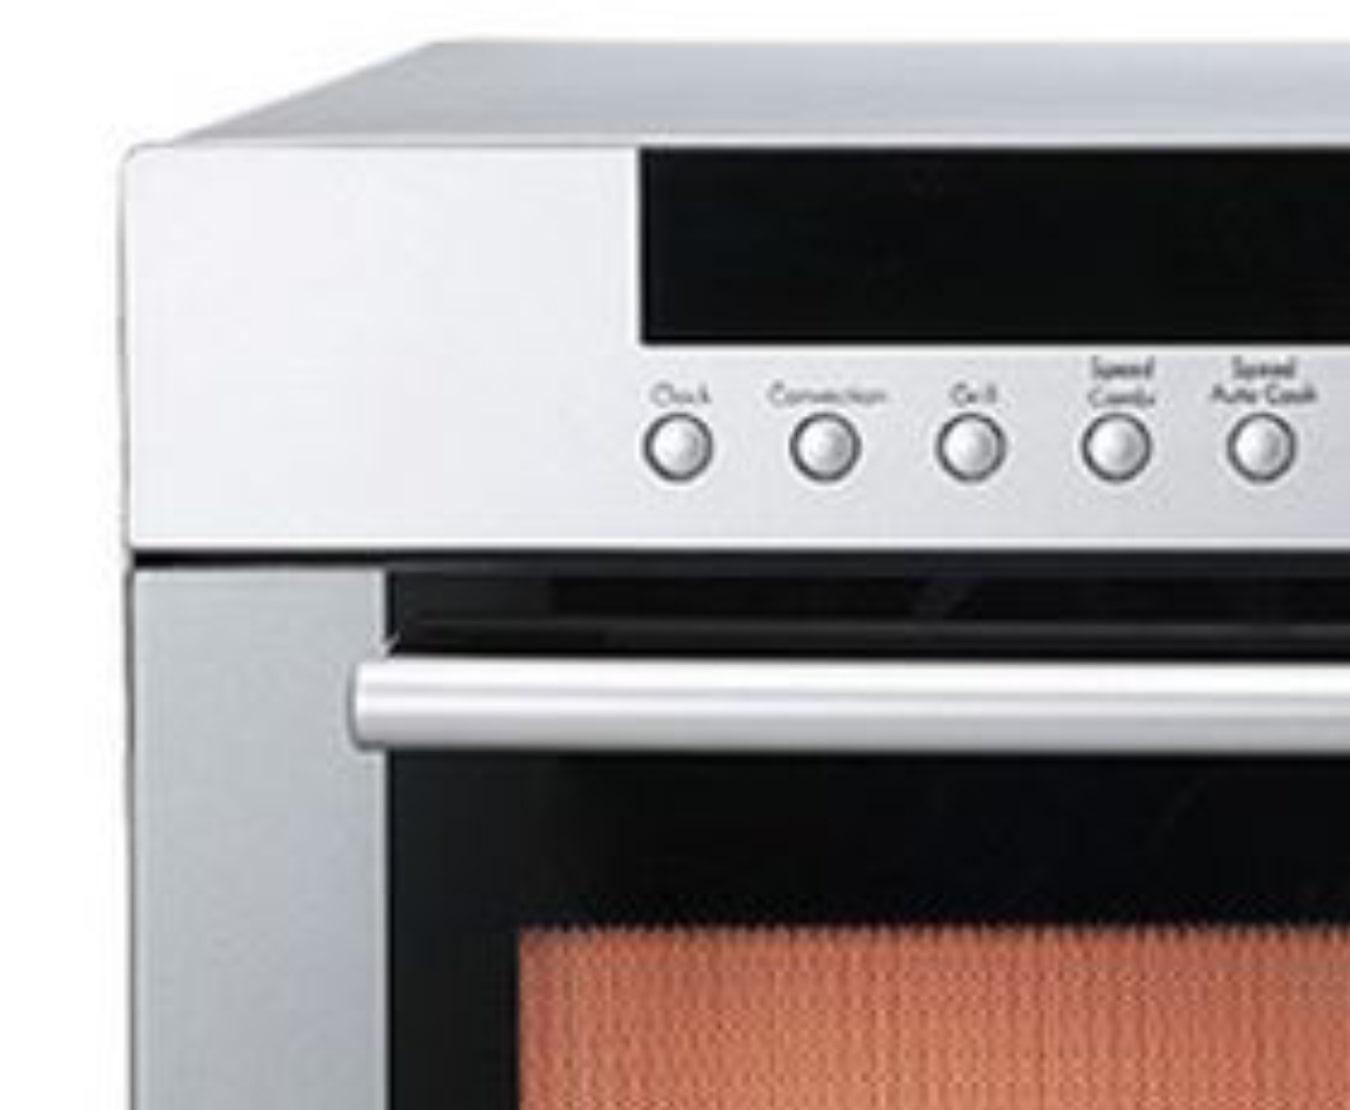 Lg Microwaves Mp 9485s Thumbnail 5